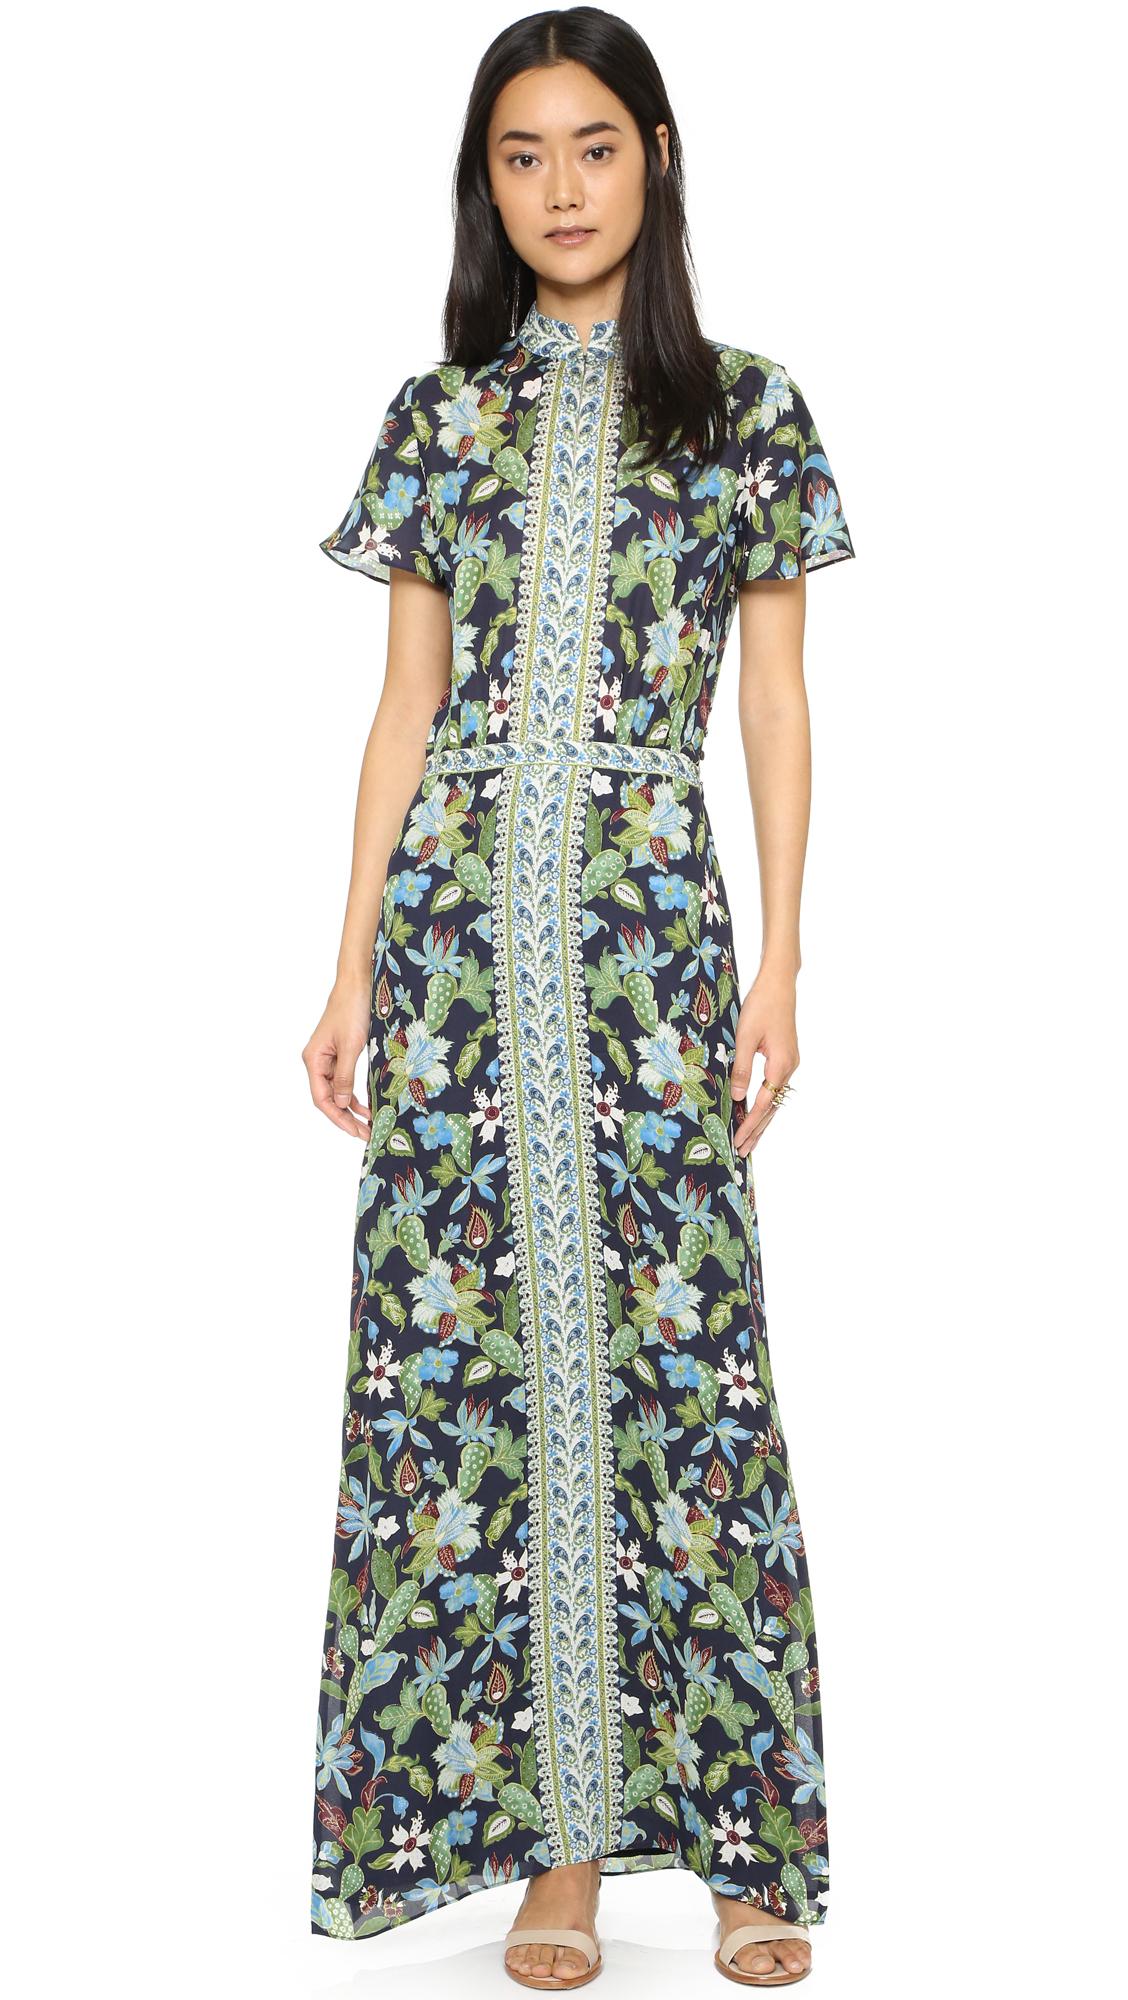 Lyst Tory Burch Printed Silk Chiffon Maxi Dress In Green